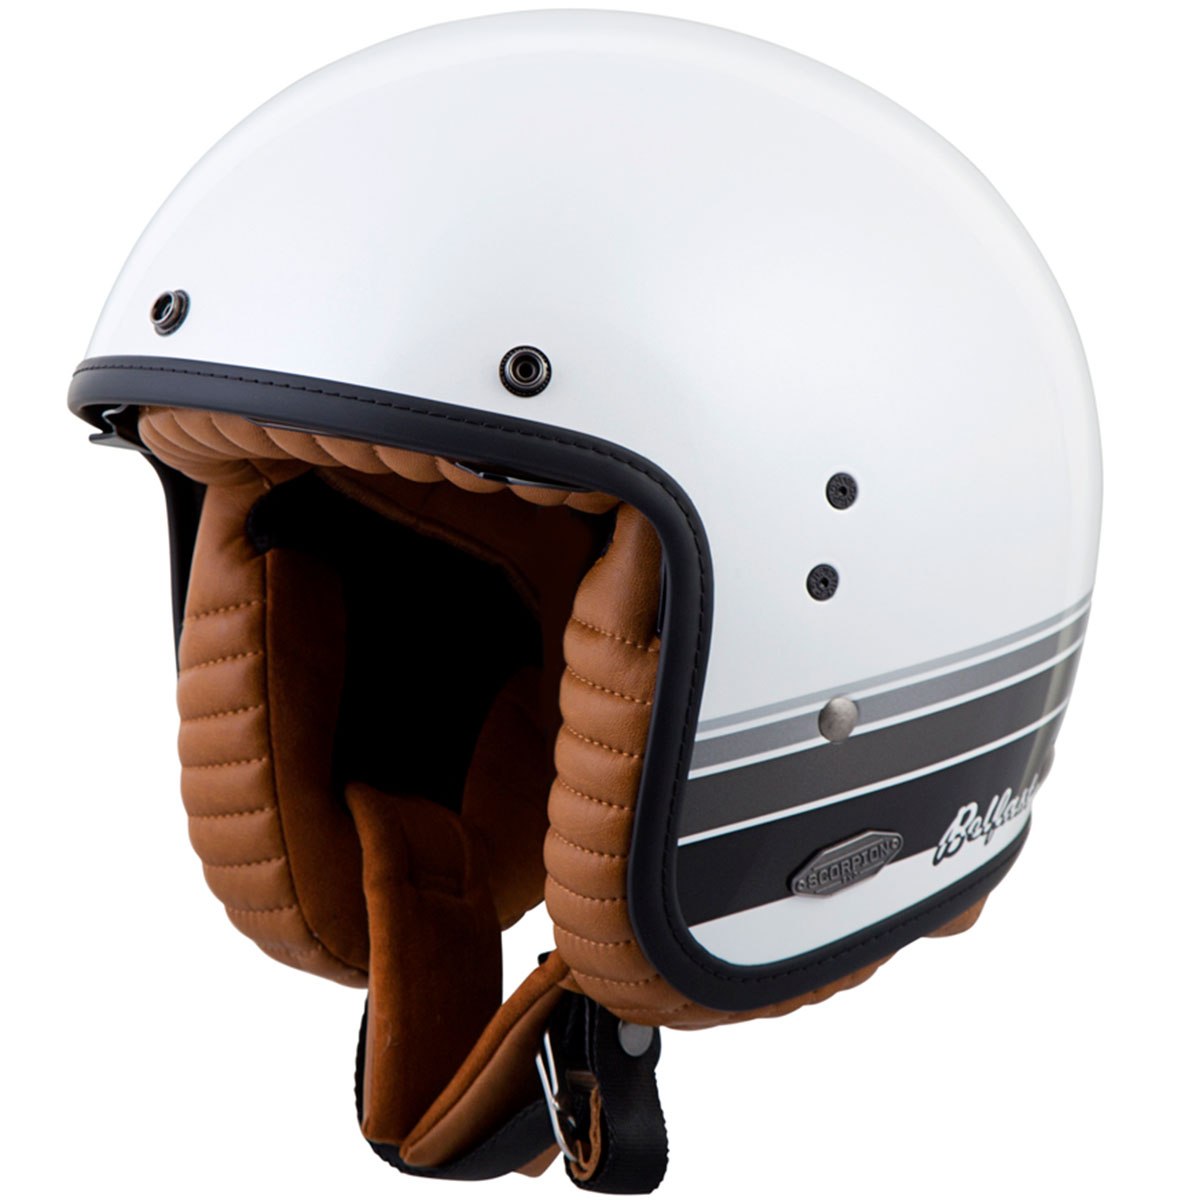 Design Helm scorpion belfast blanco open motorcycle helmet get lowered cycles